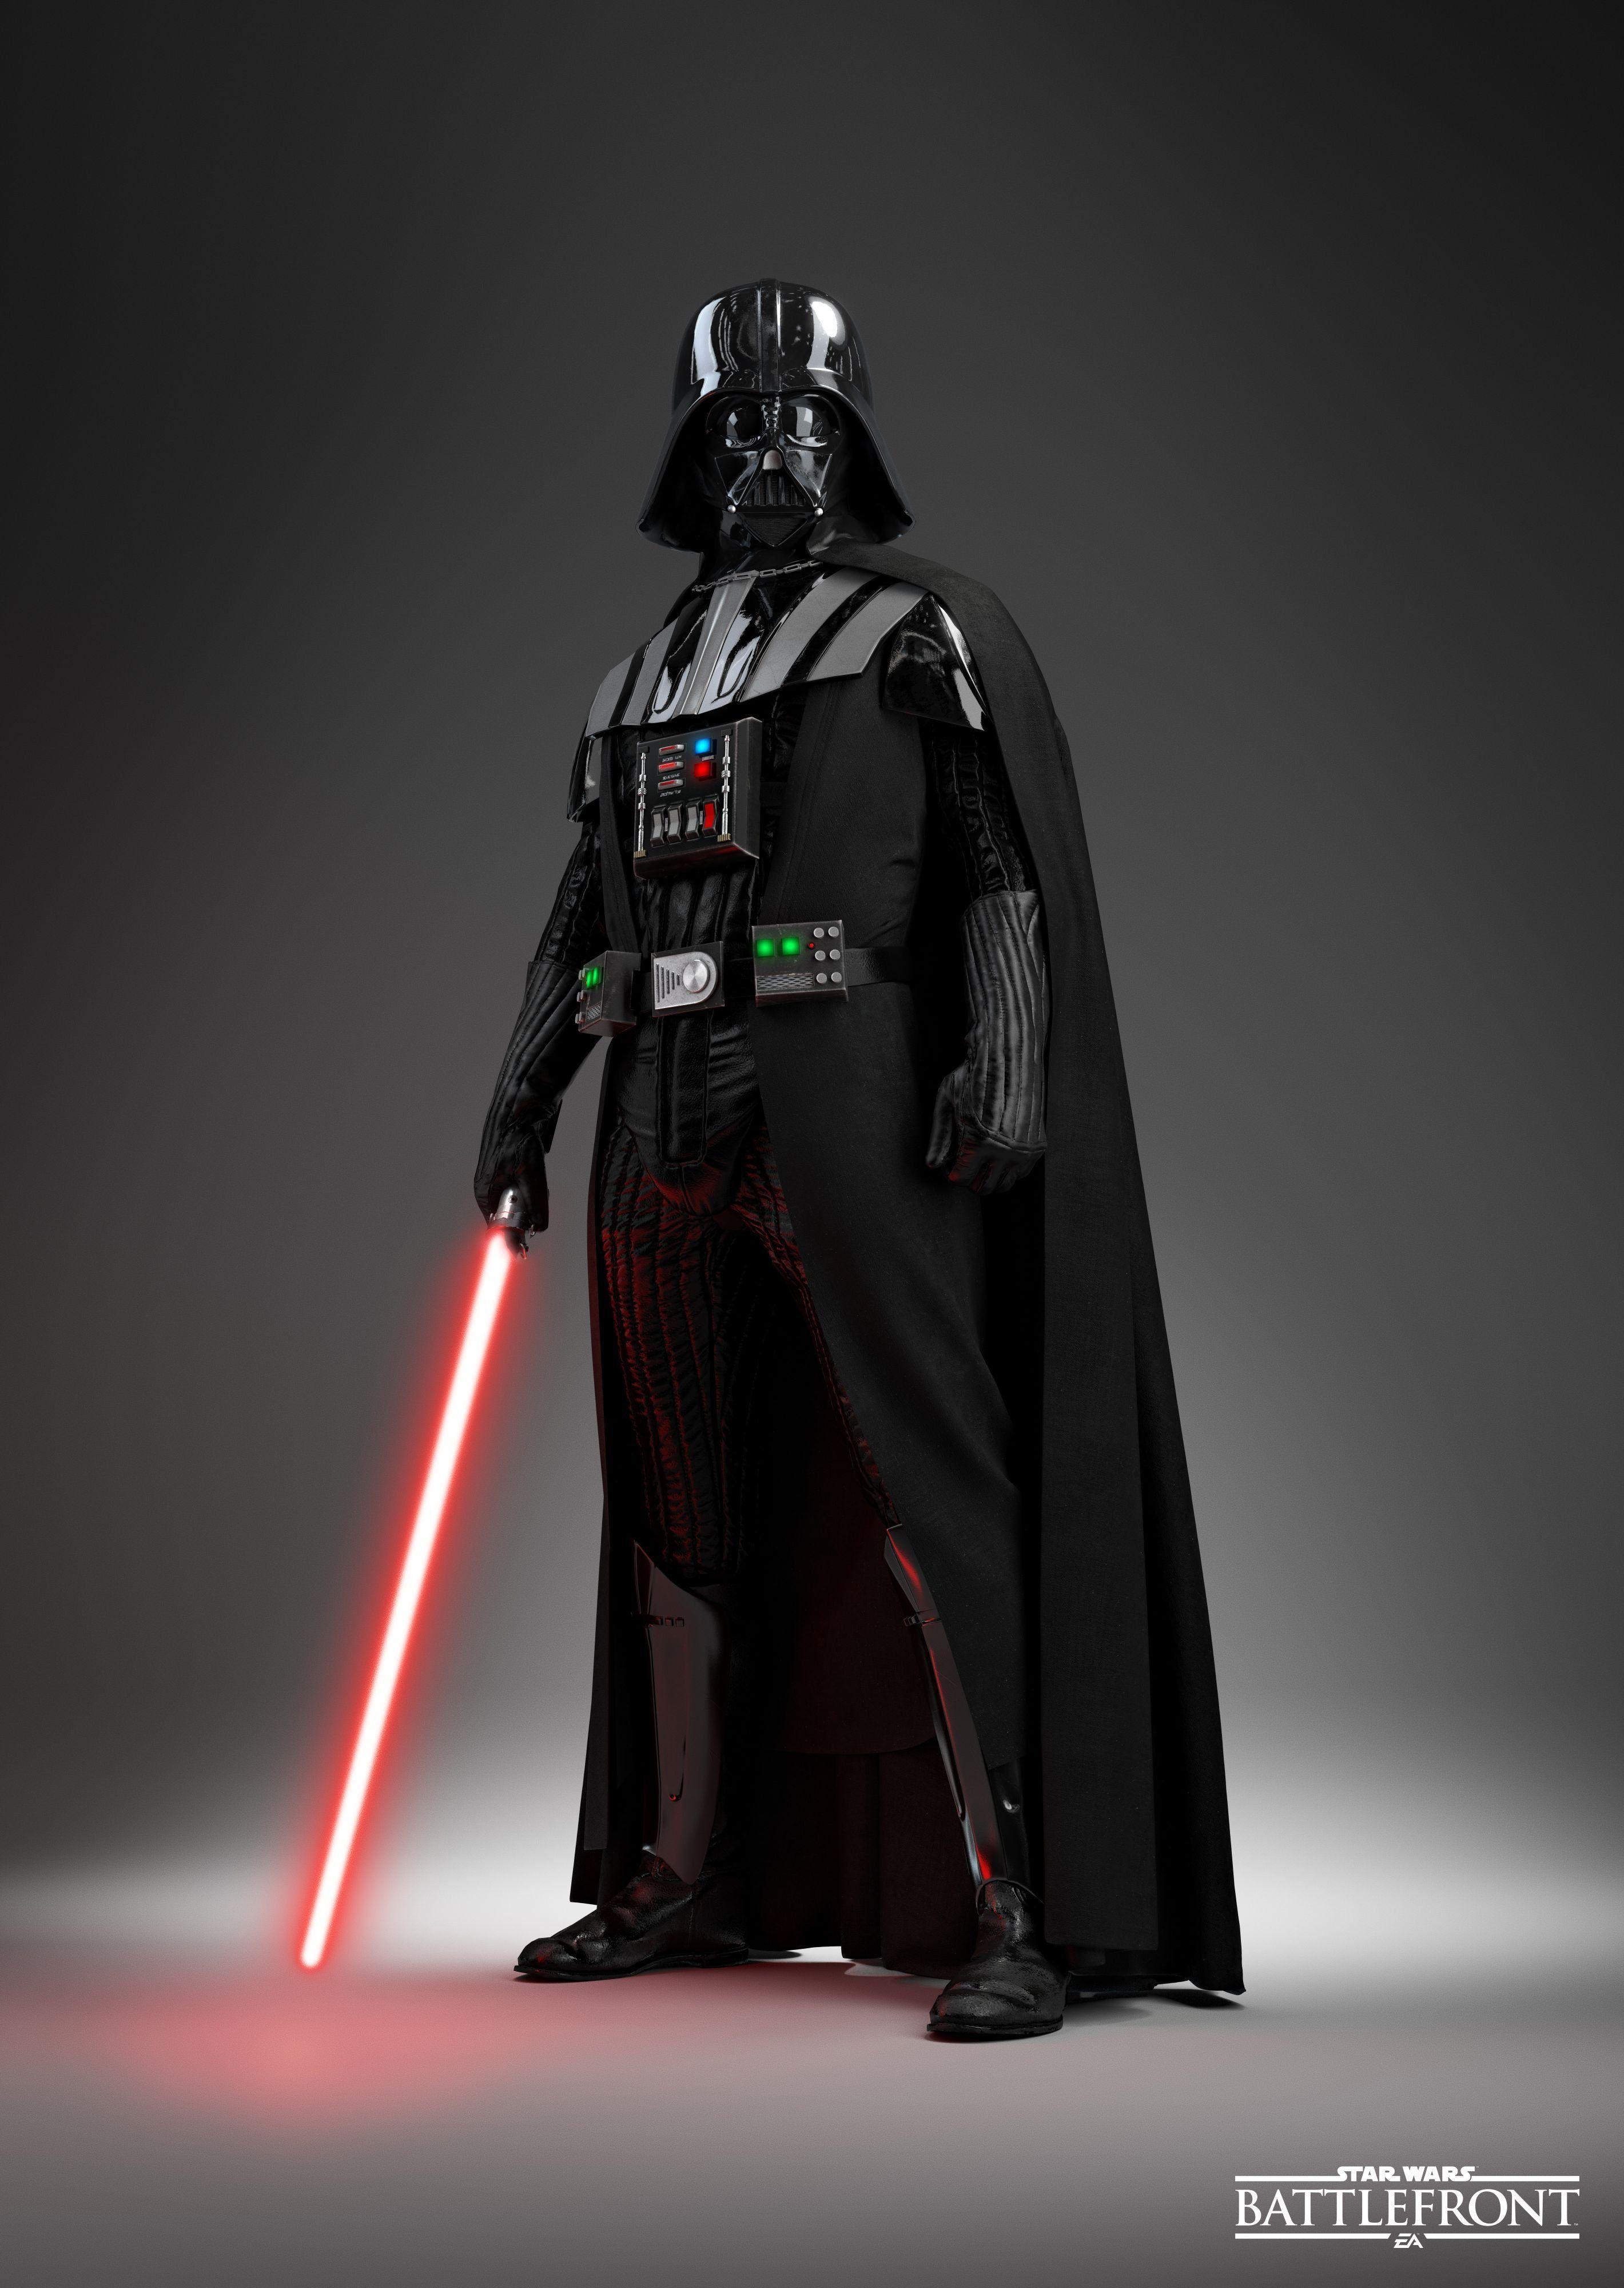 Darth Vader Wallpapers Iphone Wallpaper Cave